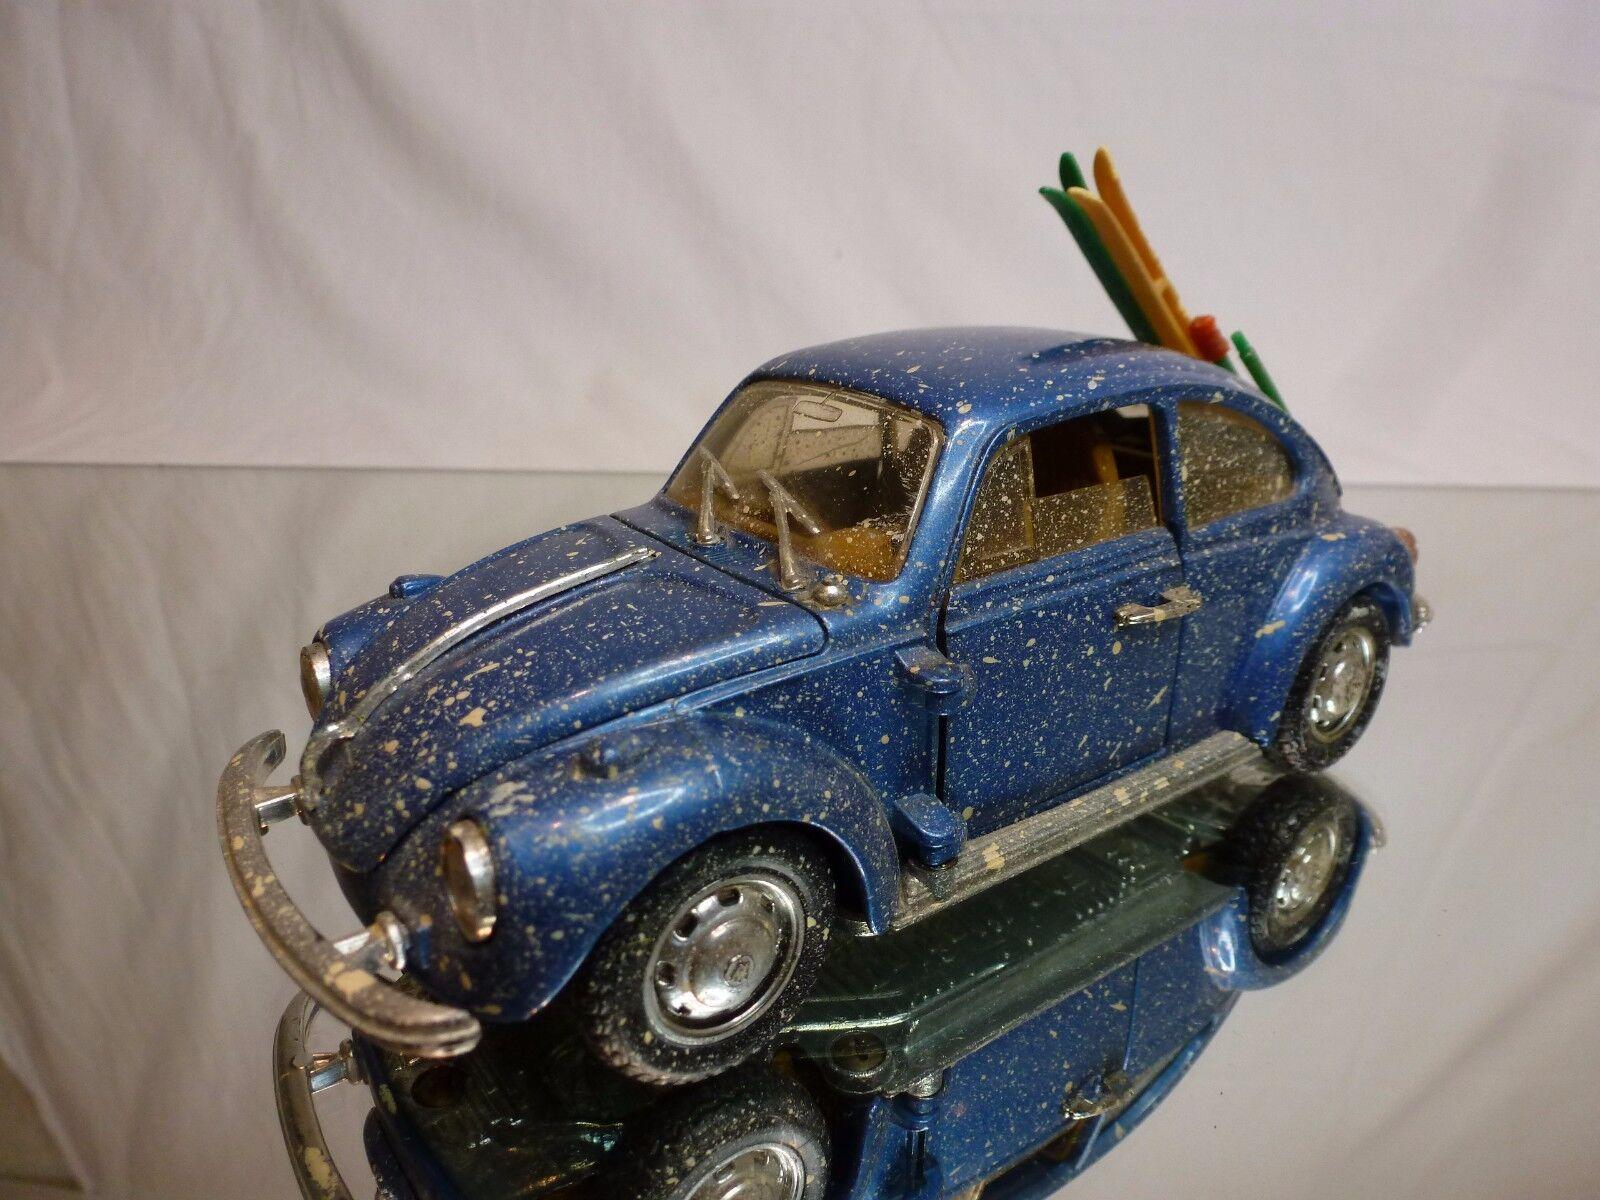 POLSTIL S15  VW VOLKSWAGEN BEETLE SKI - Blau 1 25 - GOOD CONDITION